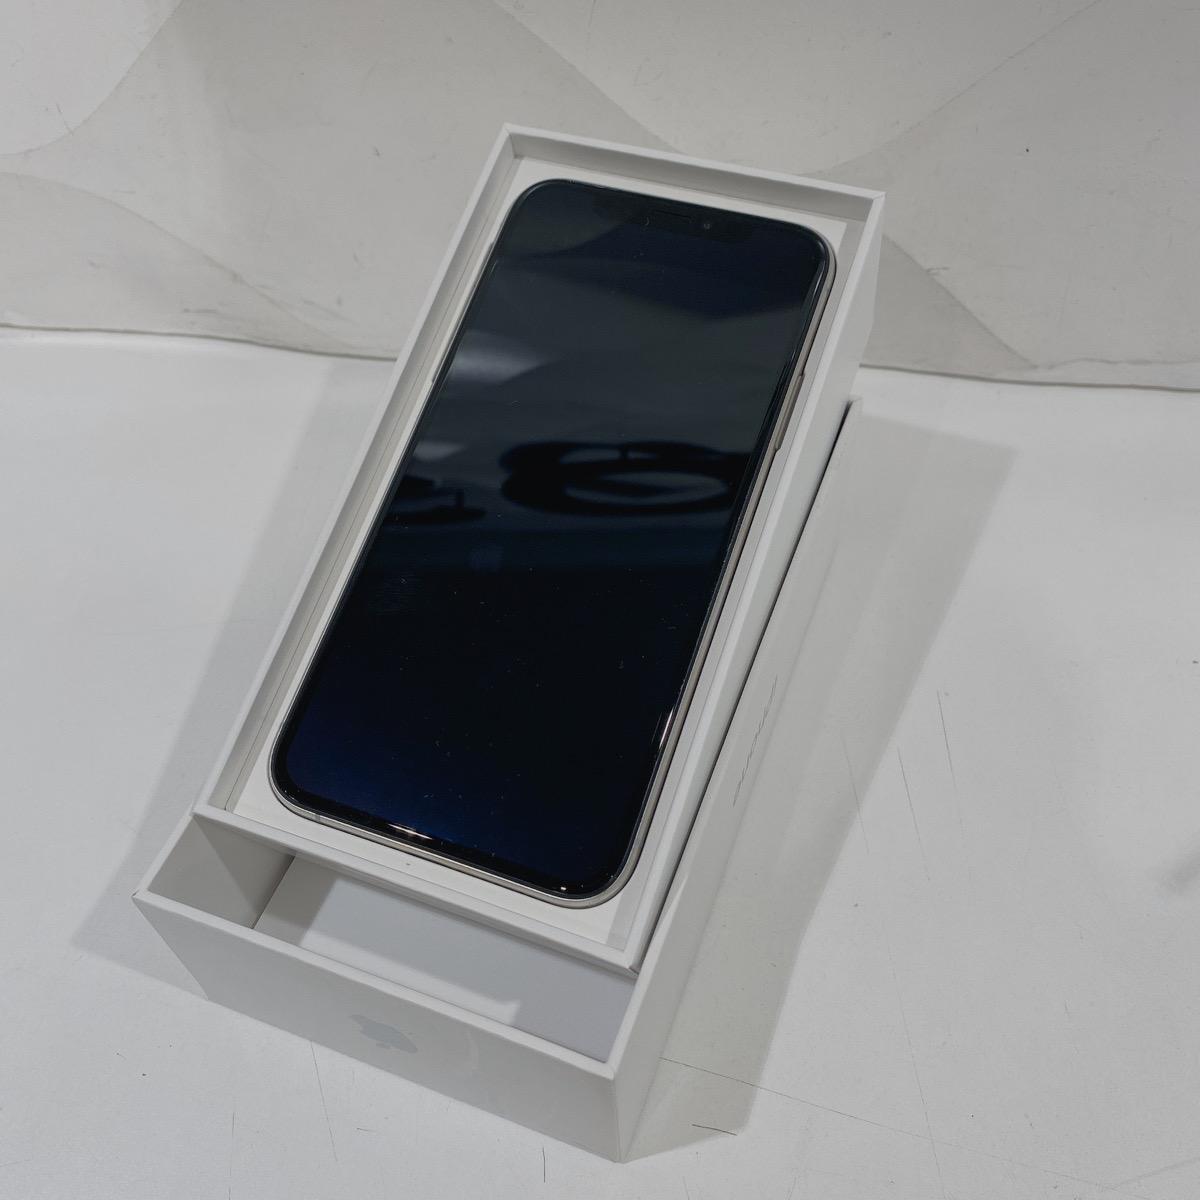 iPhoneXS256GB シルバー Docomo〇 中古 箱あり